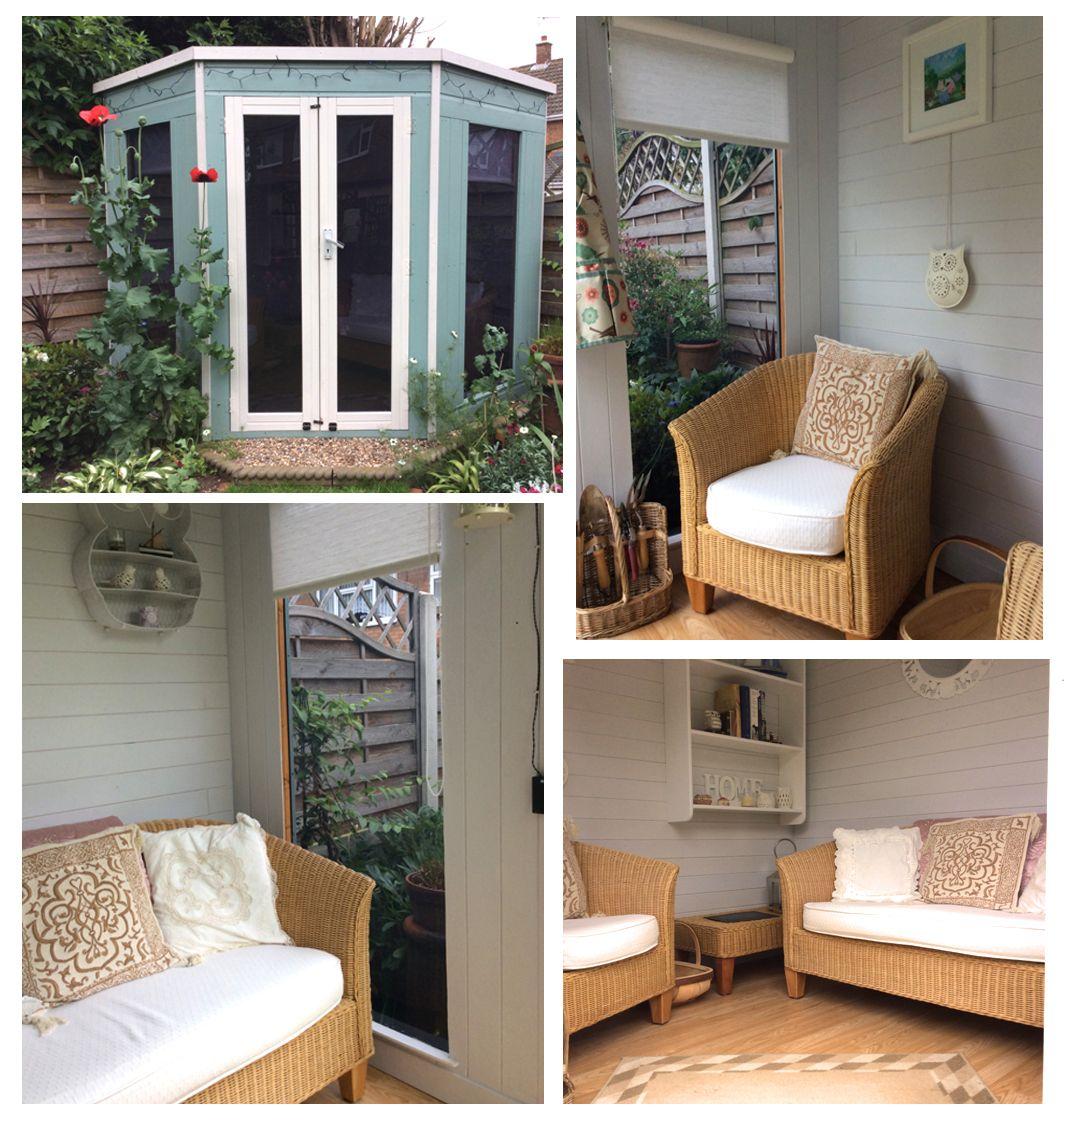 Waltons 8 x 8 Corner Summerhouse | Summer house interiors ...